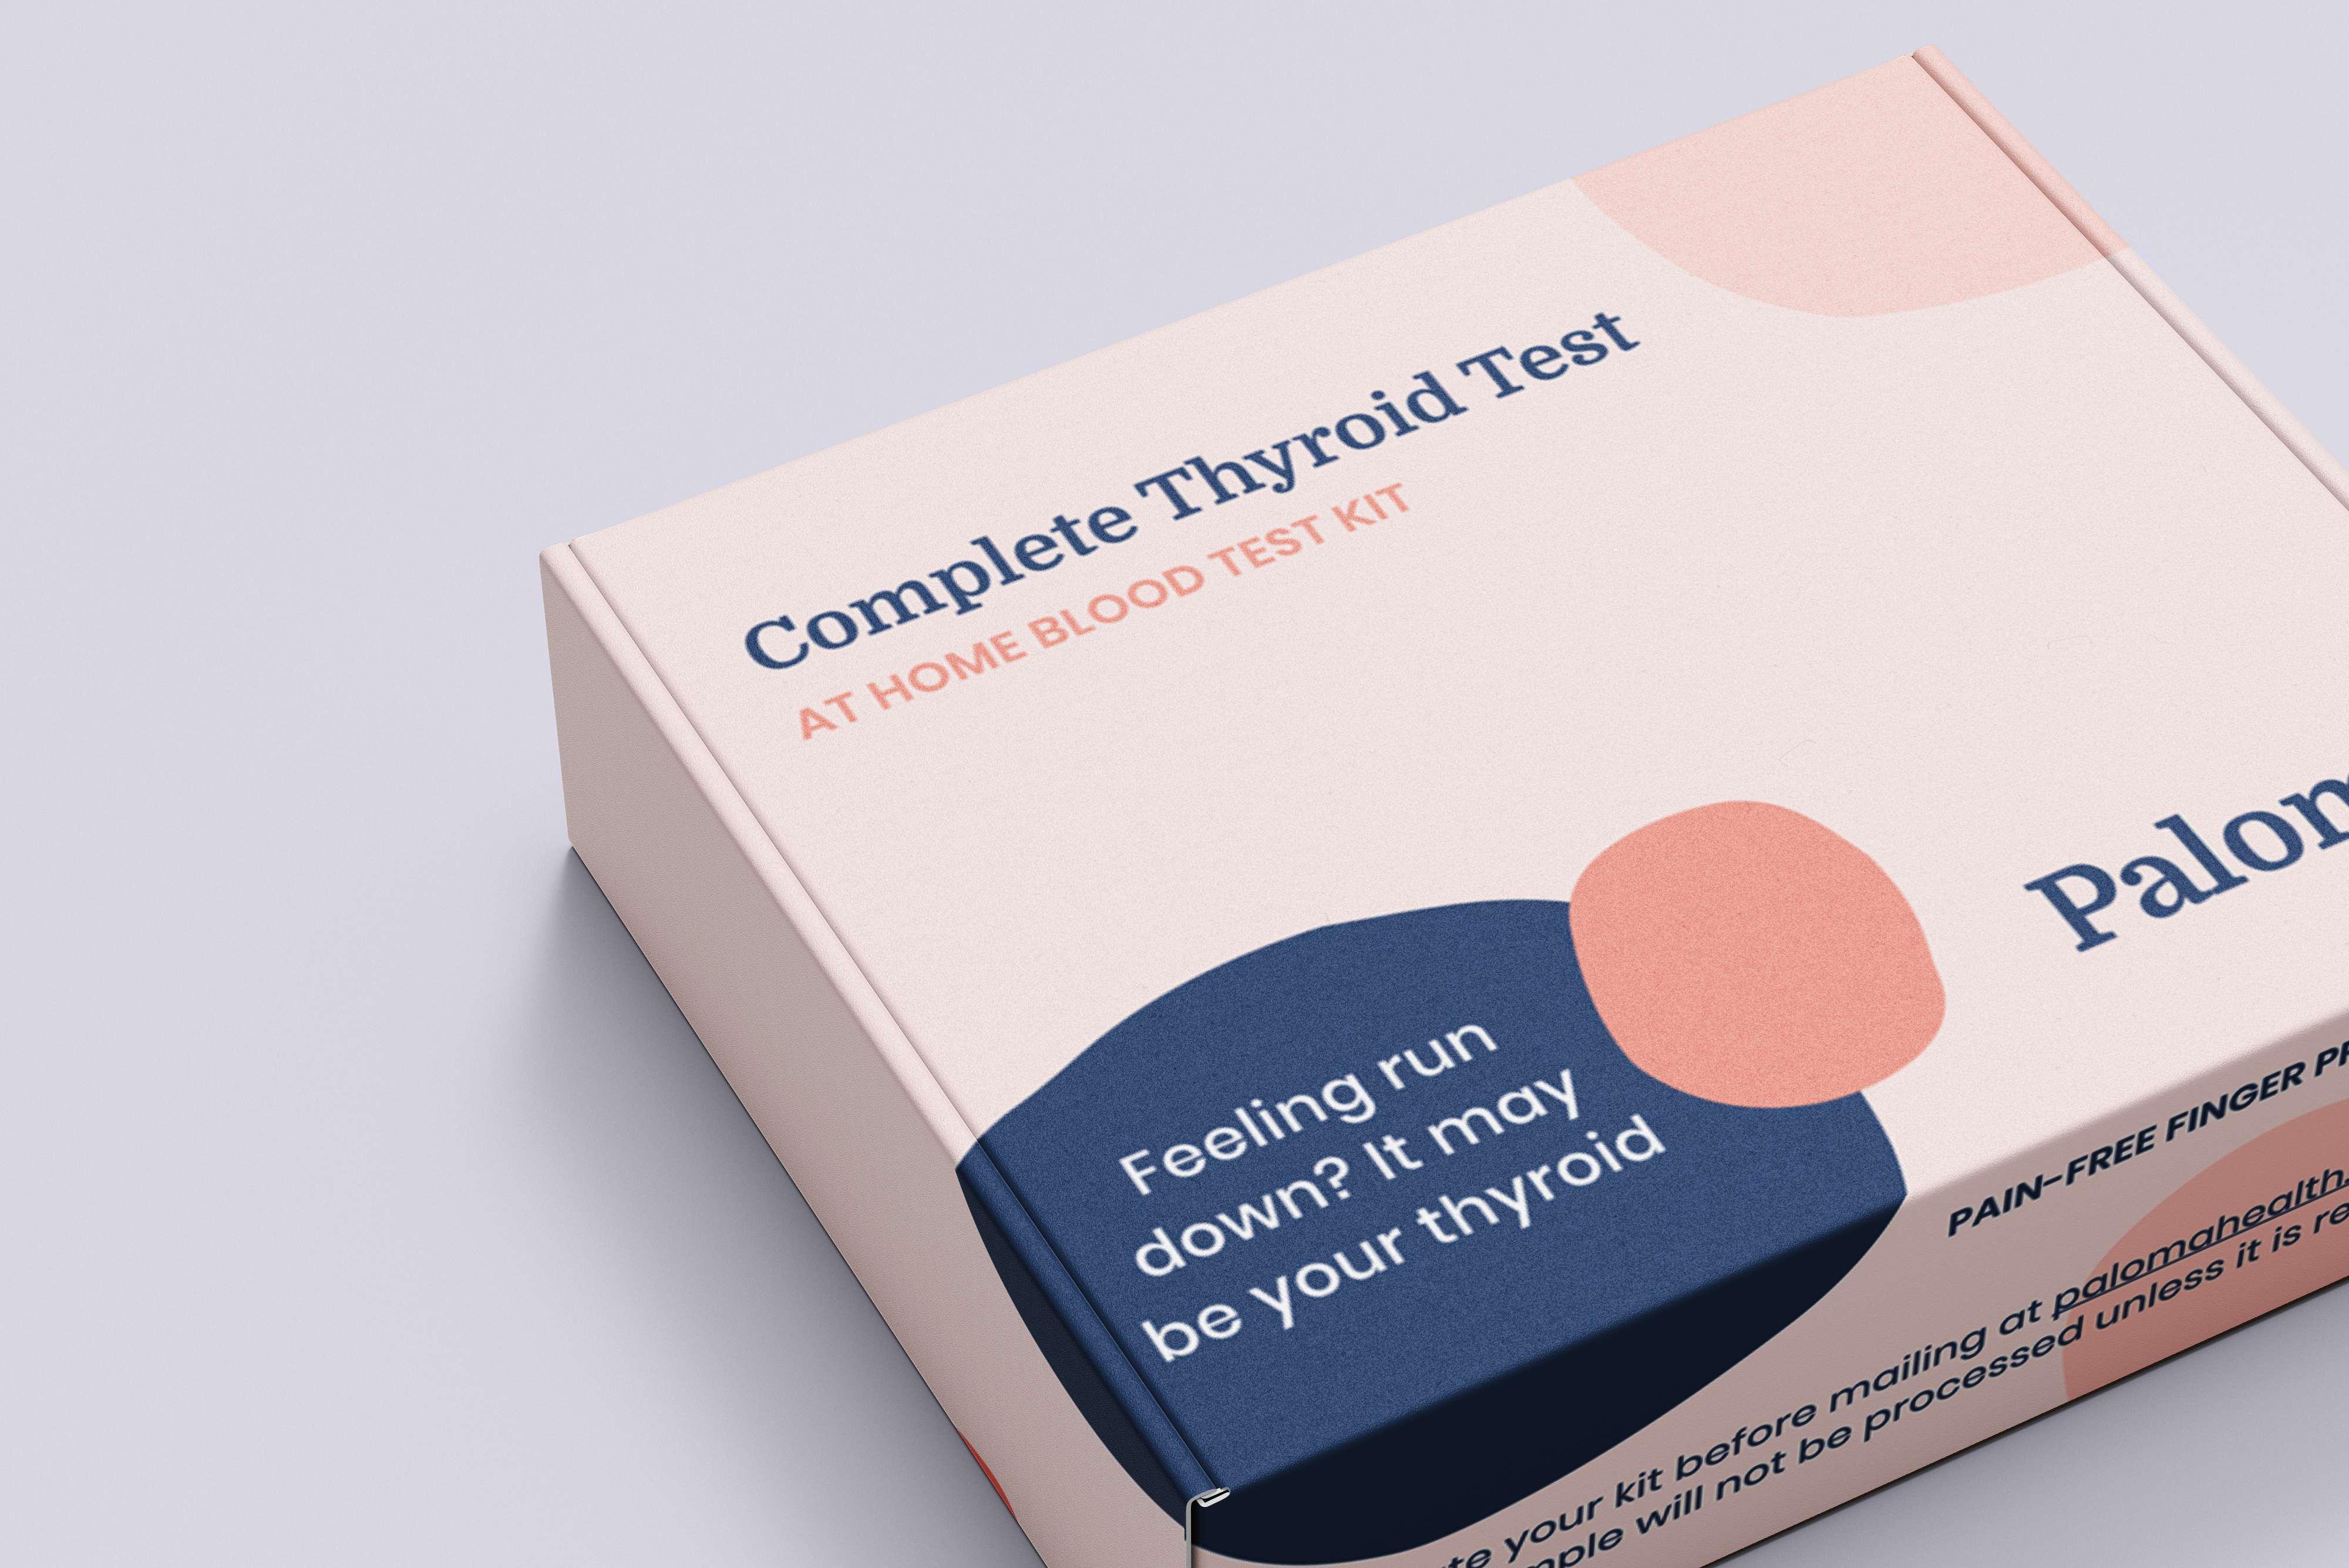 at home hypothyroidism test